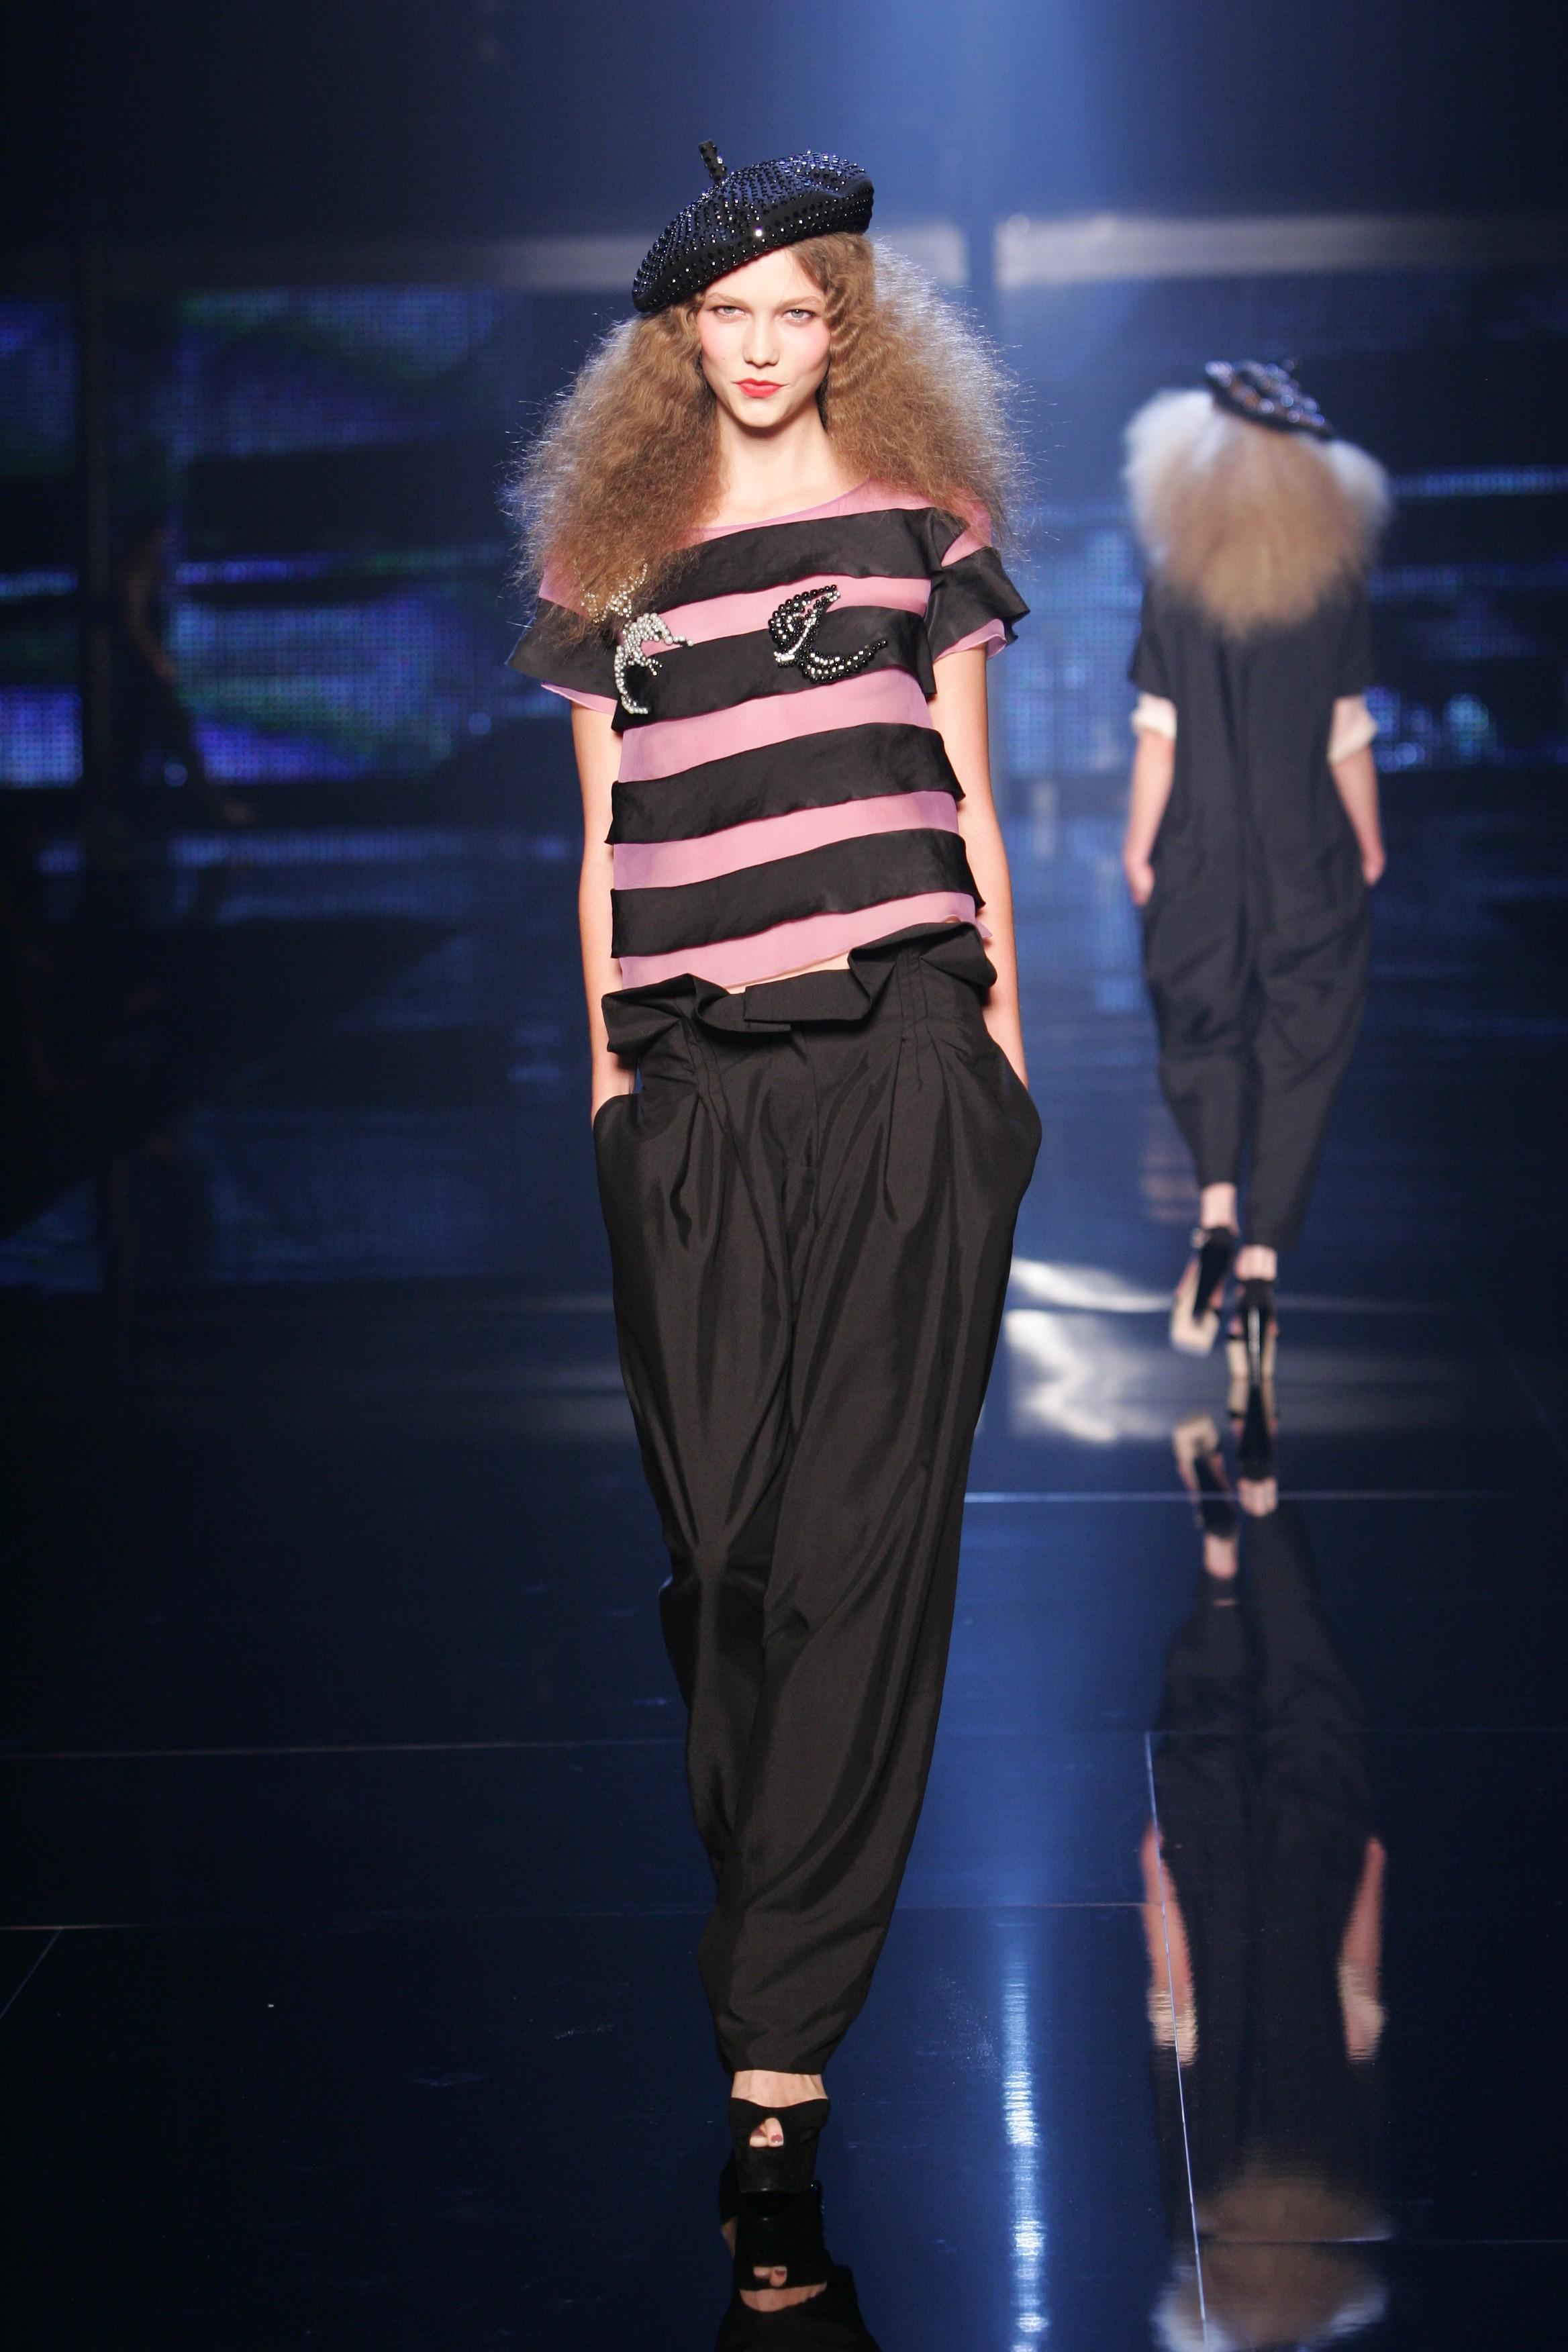 b891f35c8d FPD Tidbits of Fashion News  Sonia Rykiel for H M